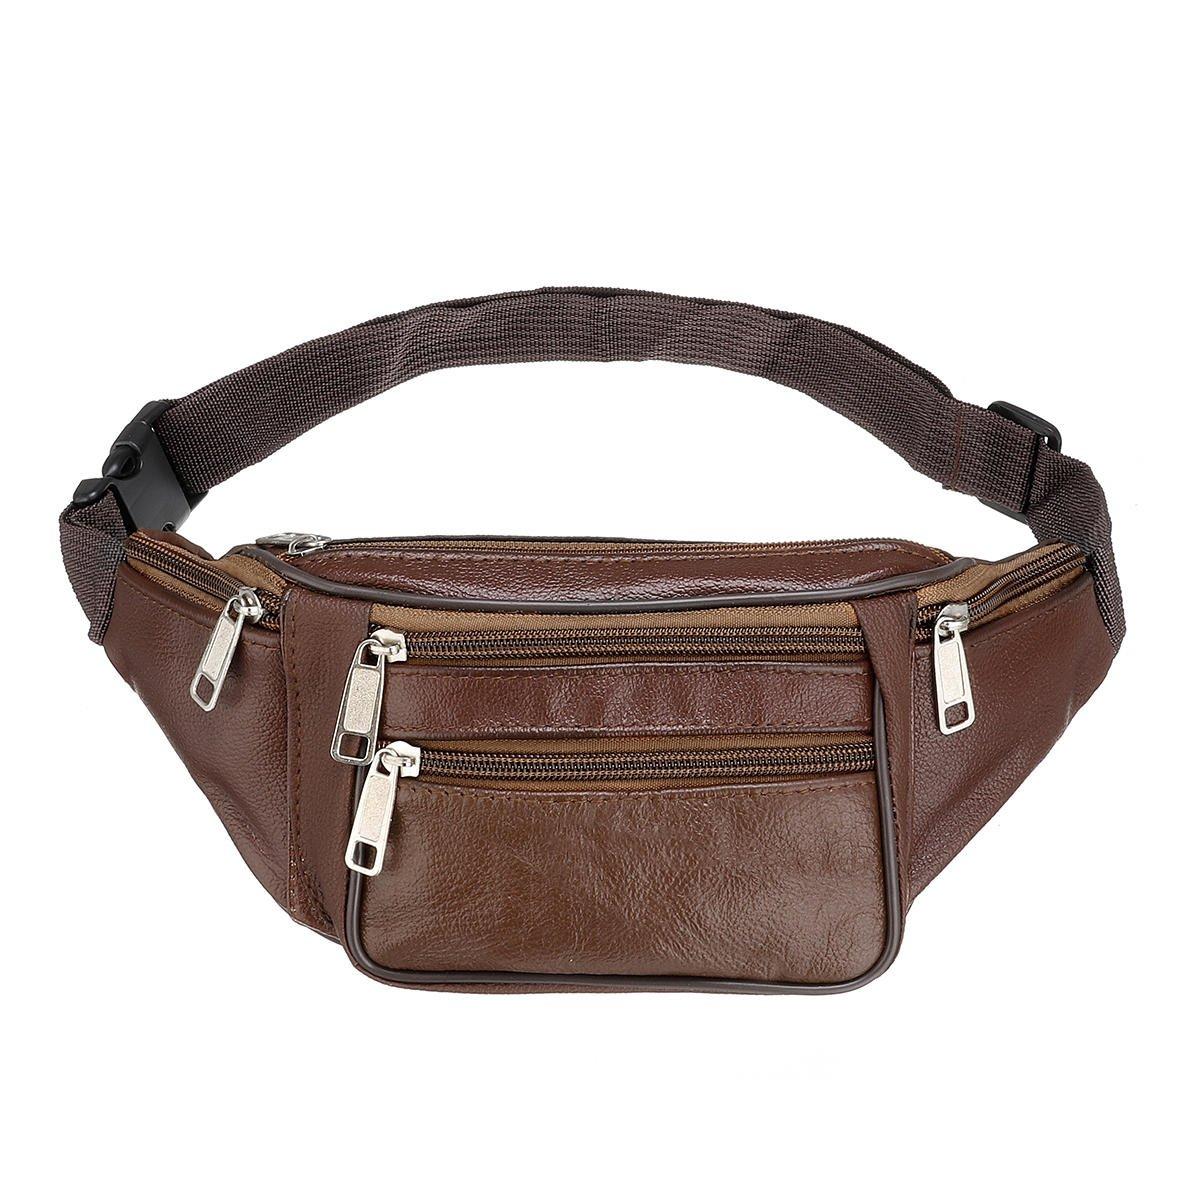 Athletics Waistline Suitcase - Outdoor Leather Waist Bag Zipper Chest Sport Handbag Shoulder - Lark Sportswoman Purse Cavort Base Rollick Grip Boast Udder Play Pocket Mutation Cup - 1PCs